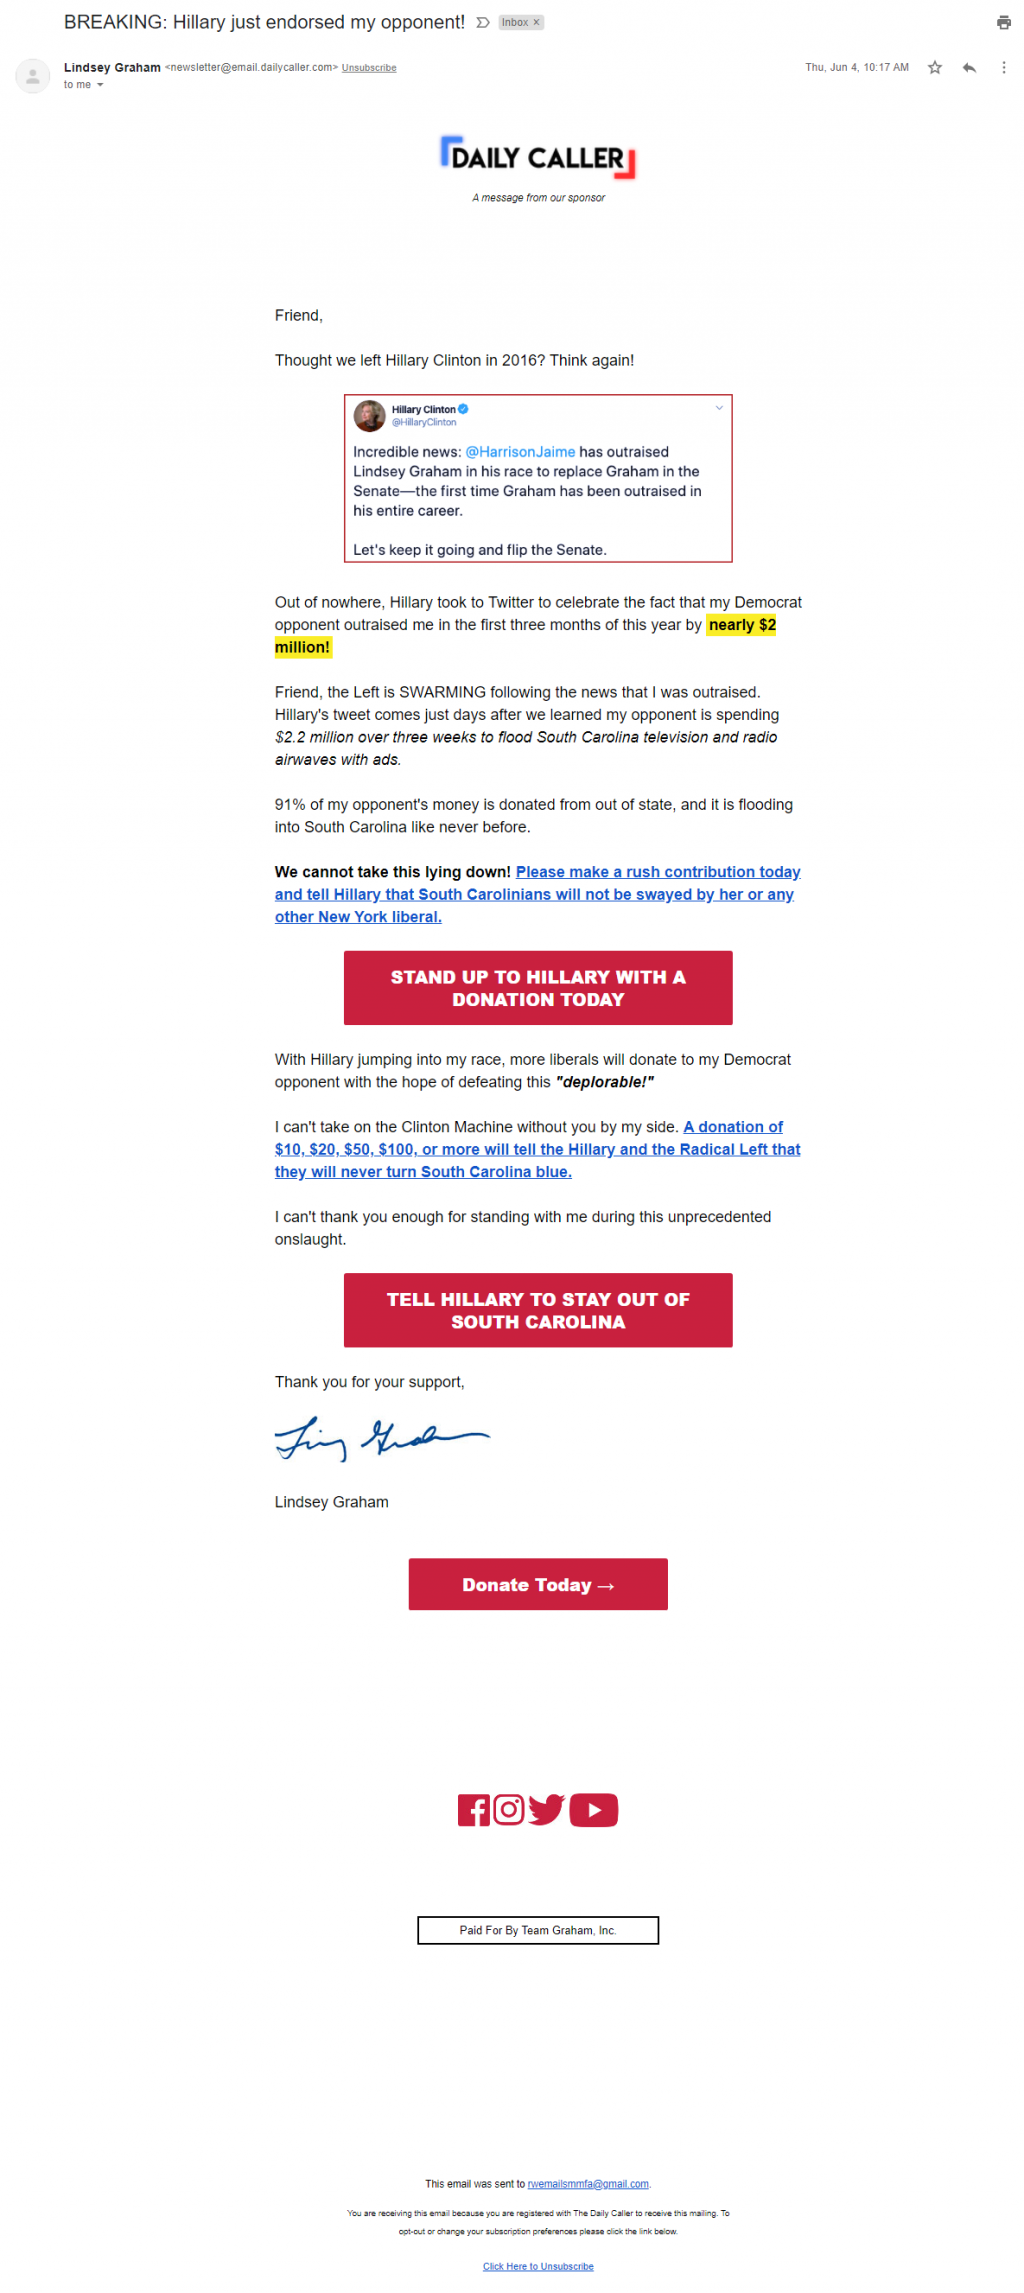 Daily Caller sponsored email for Lindsey Graham